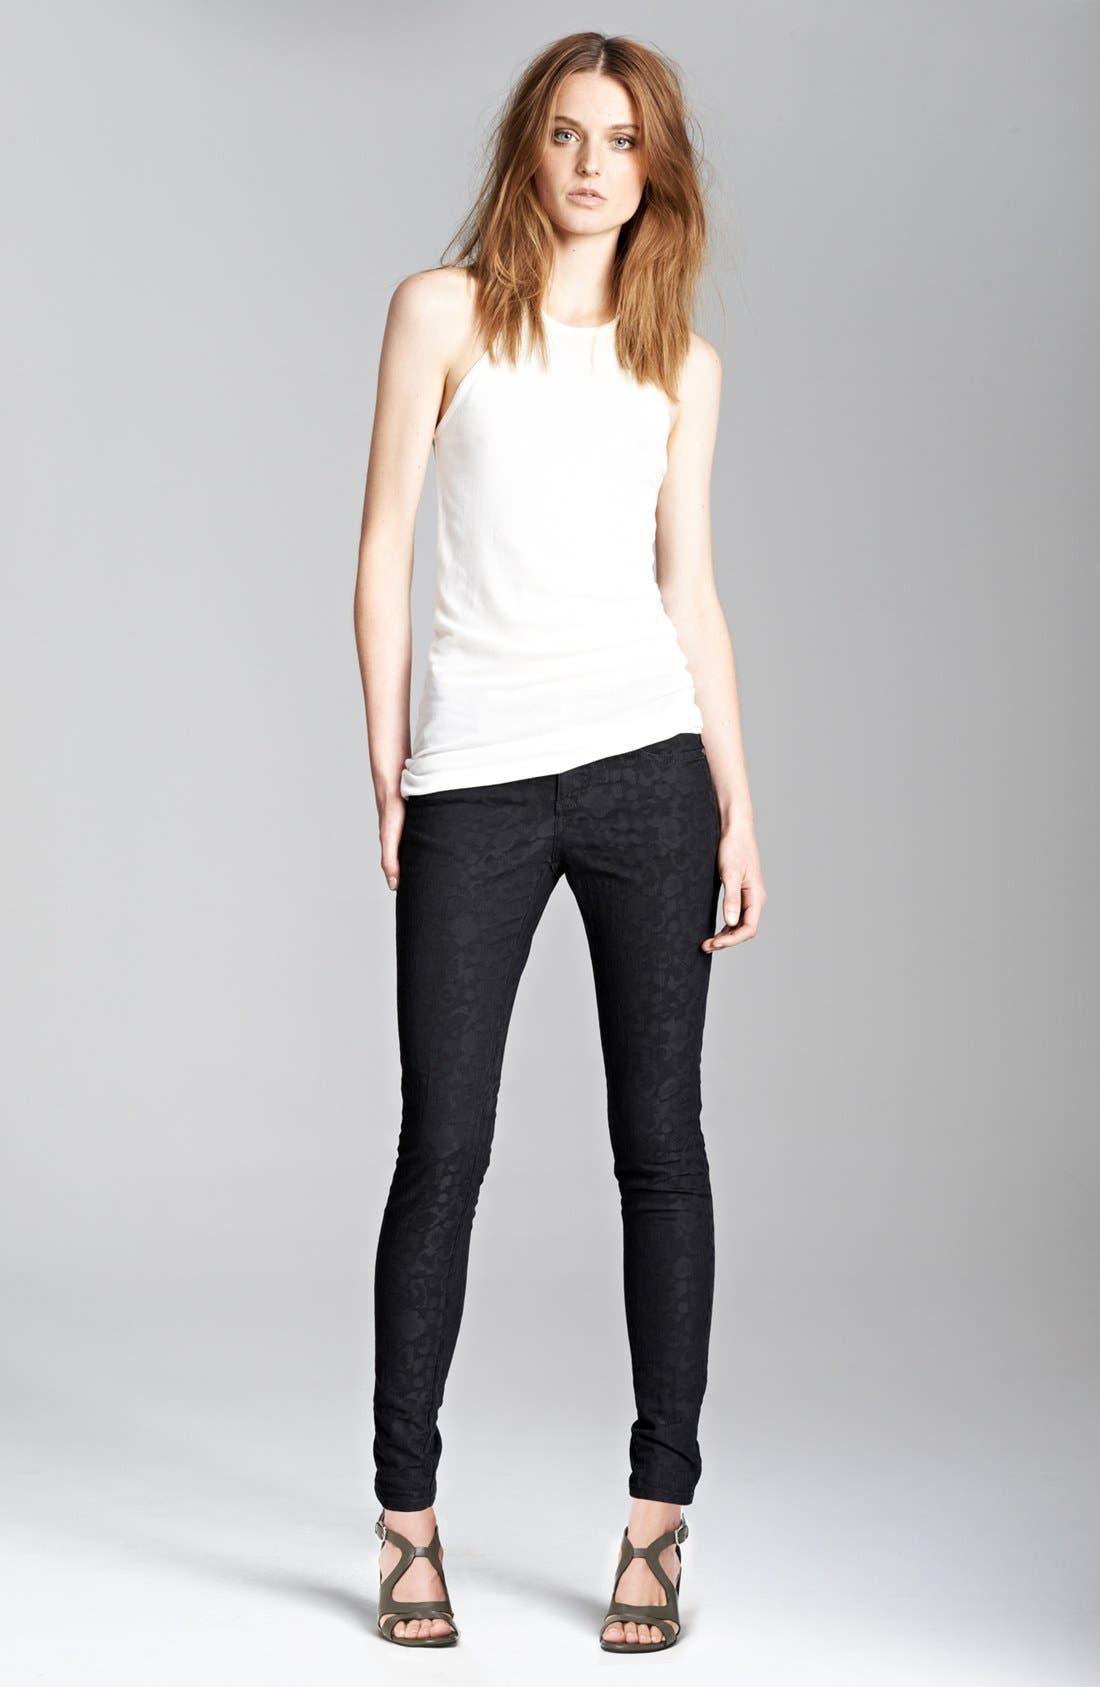 Main Image - J Brand Ready-To-Wear Camisole & Stella McCartney Skinny Jeans